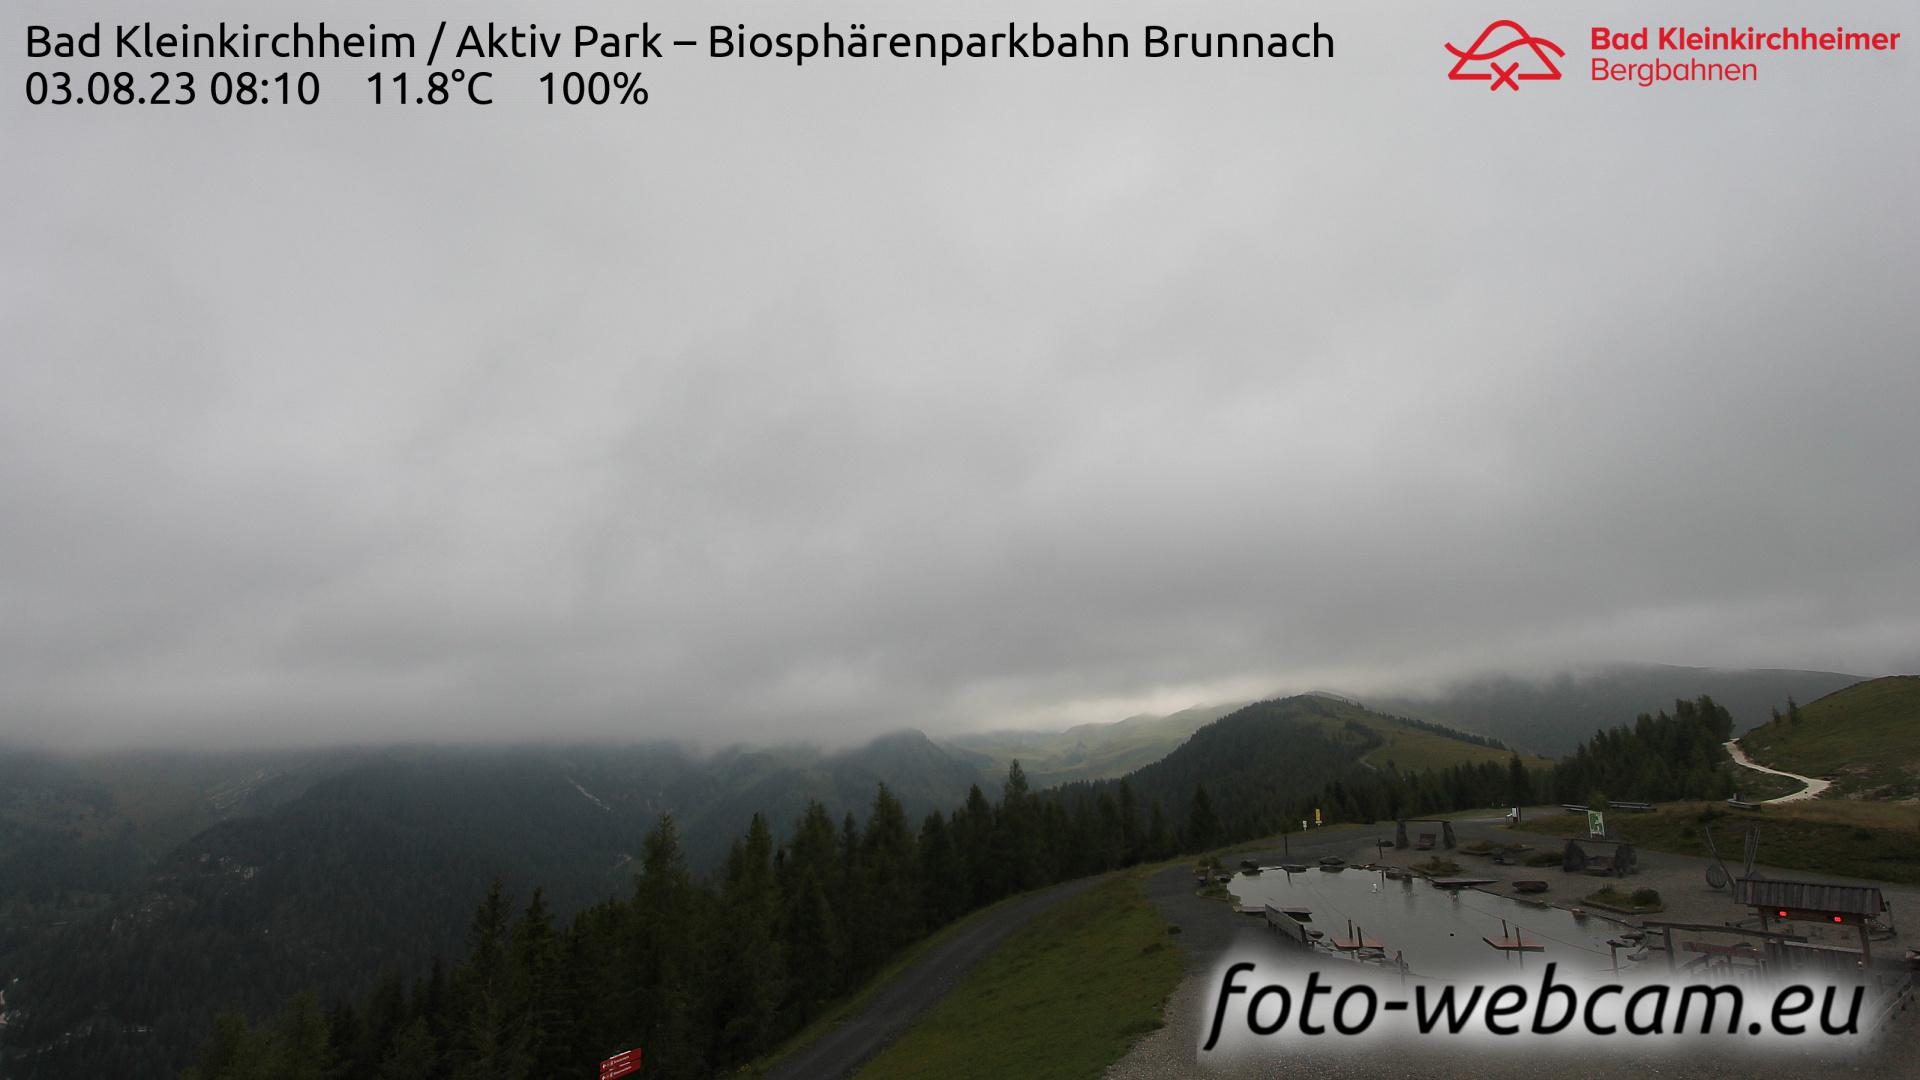 Bad Kleinkirchheim Fri. 08:30